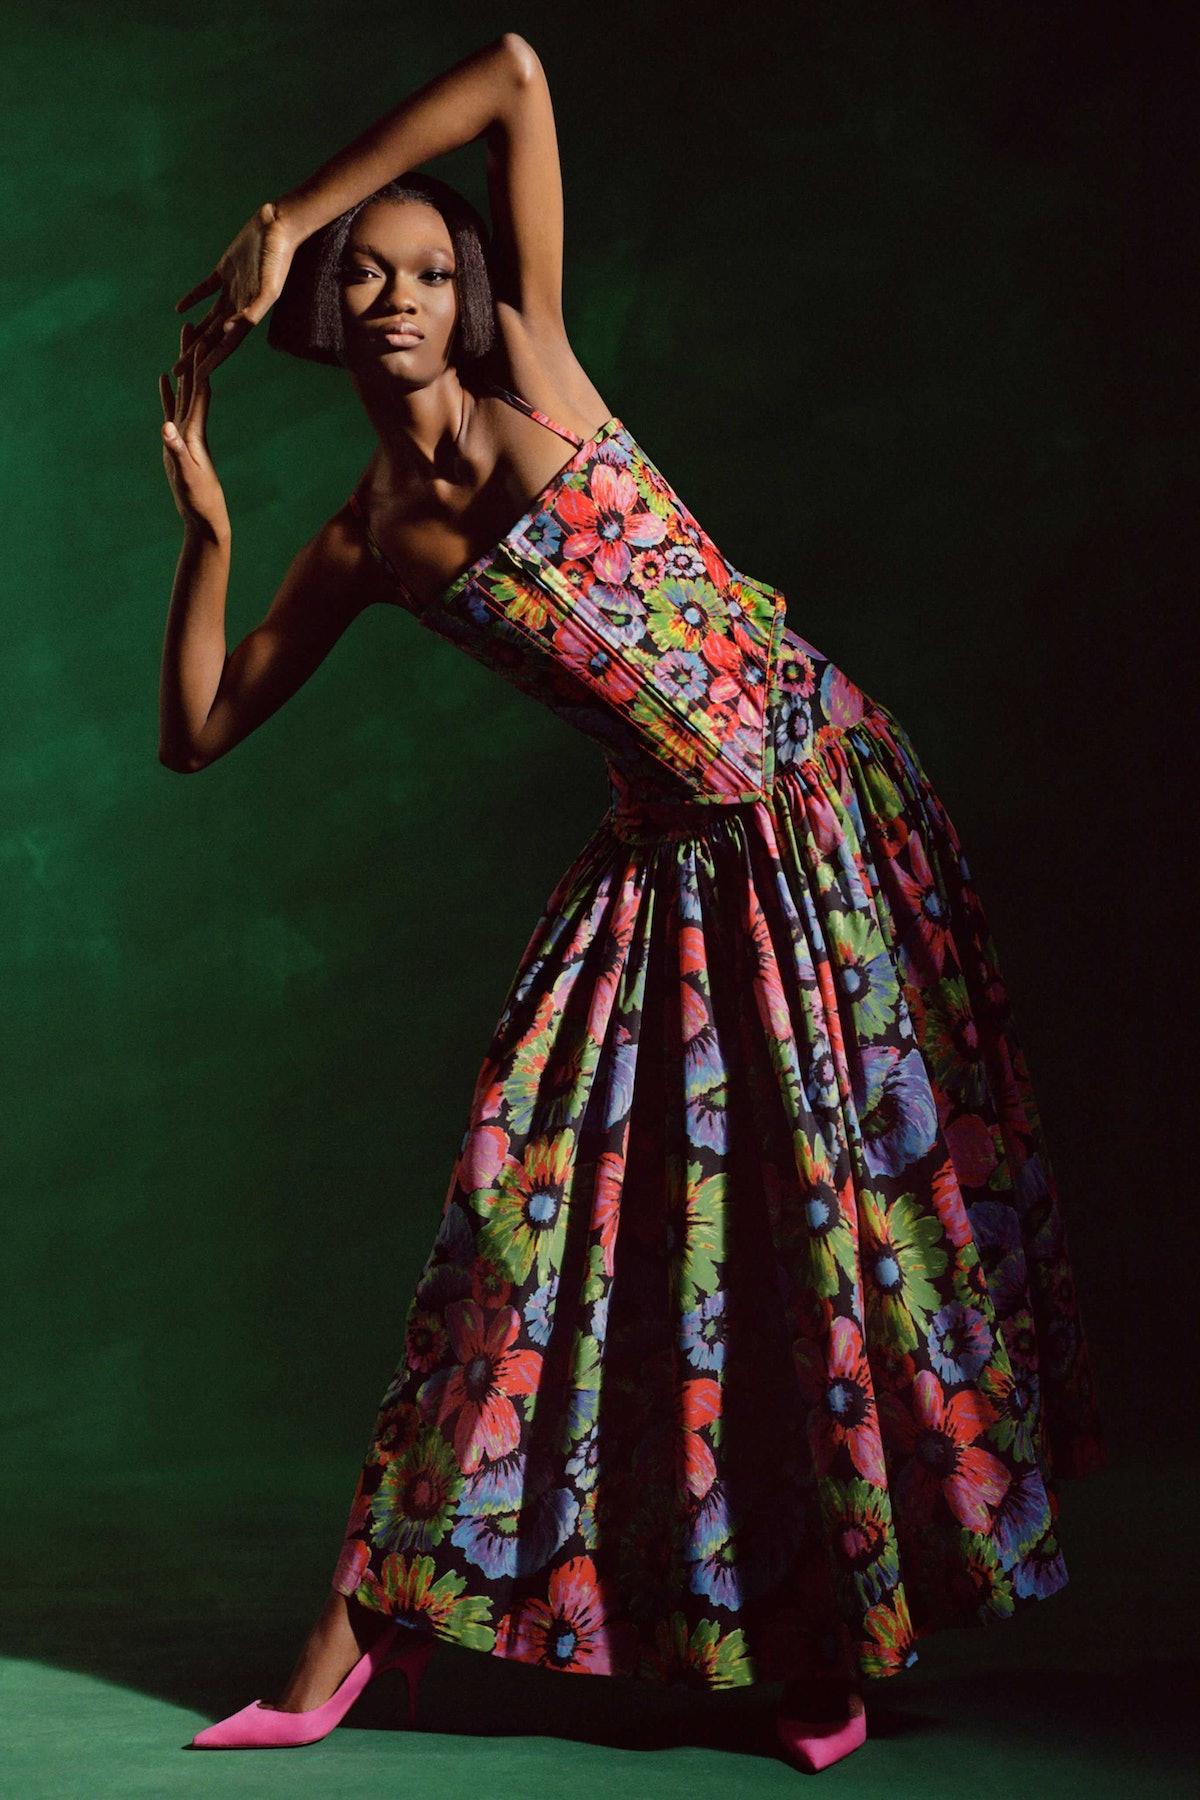 Model in floral dress